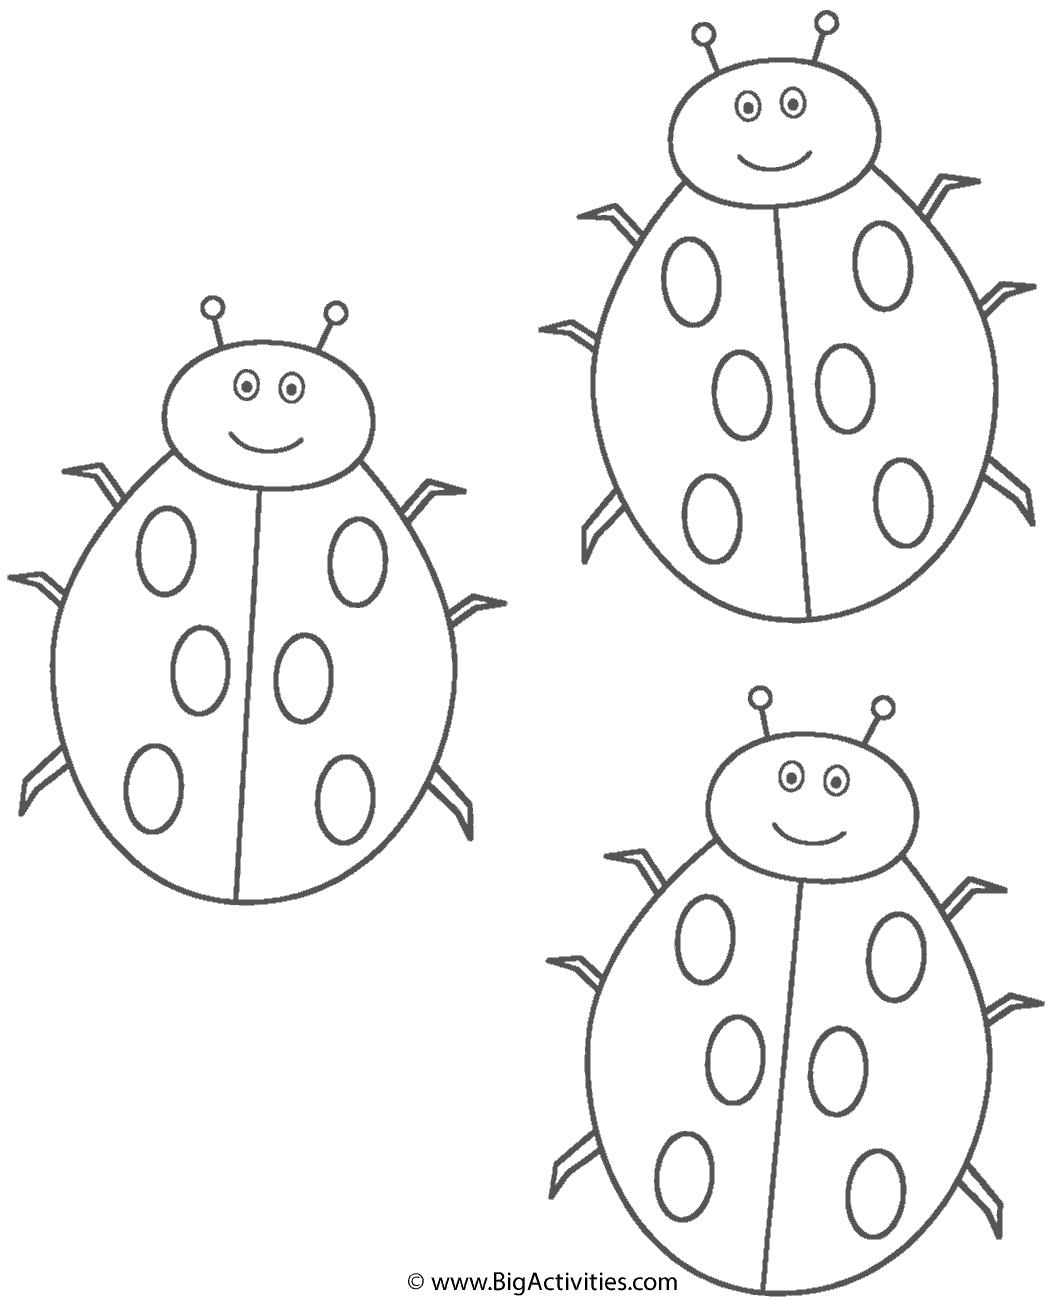 Three Ladybugs